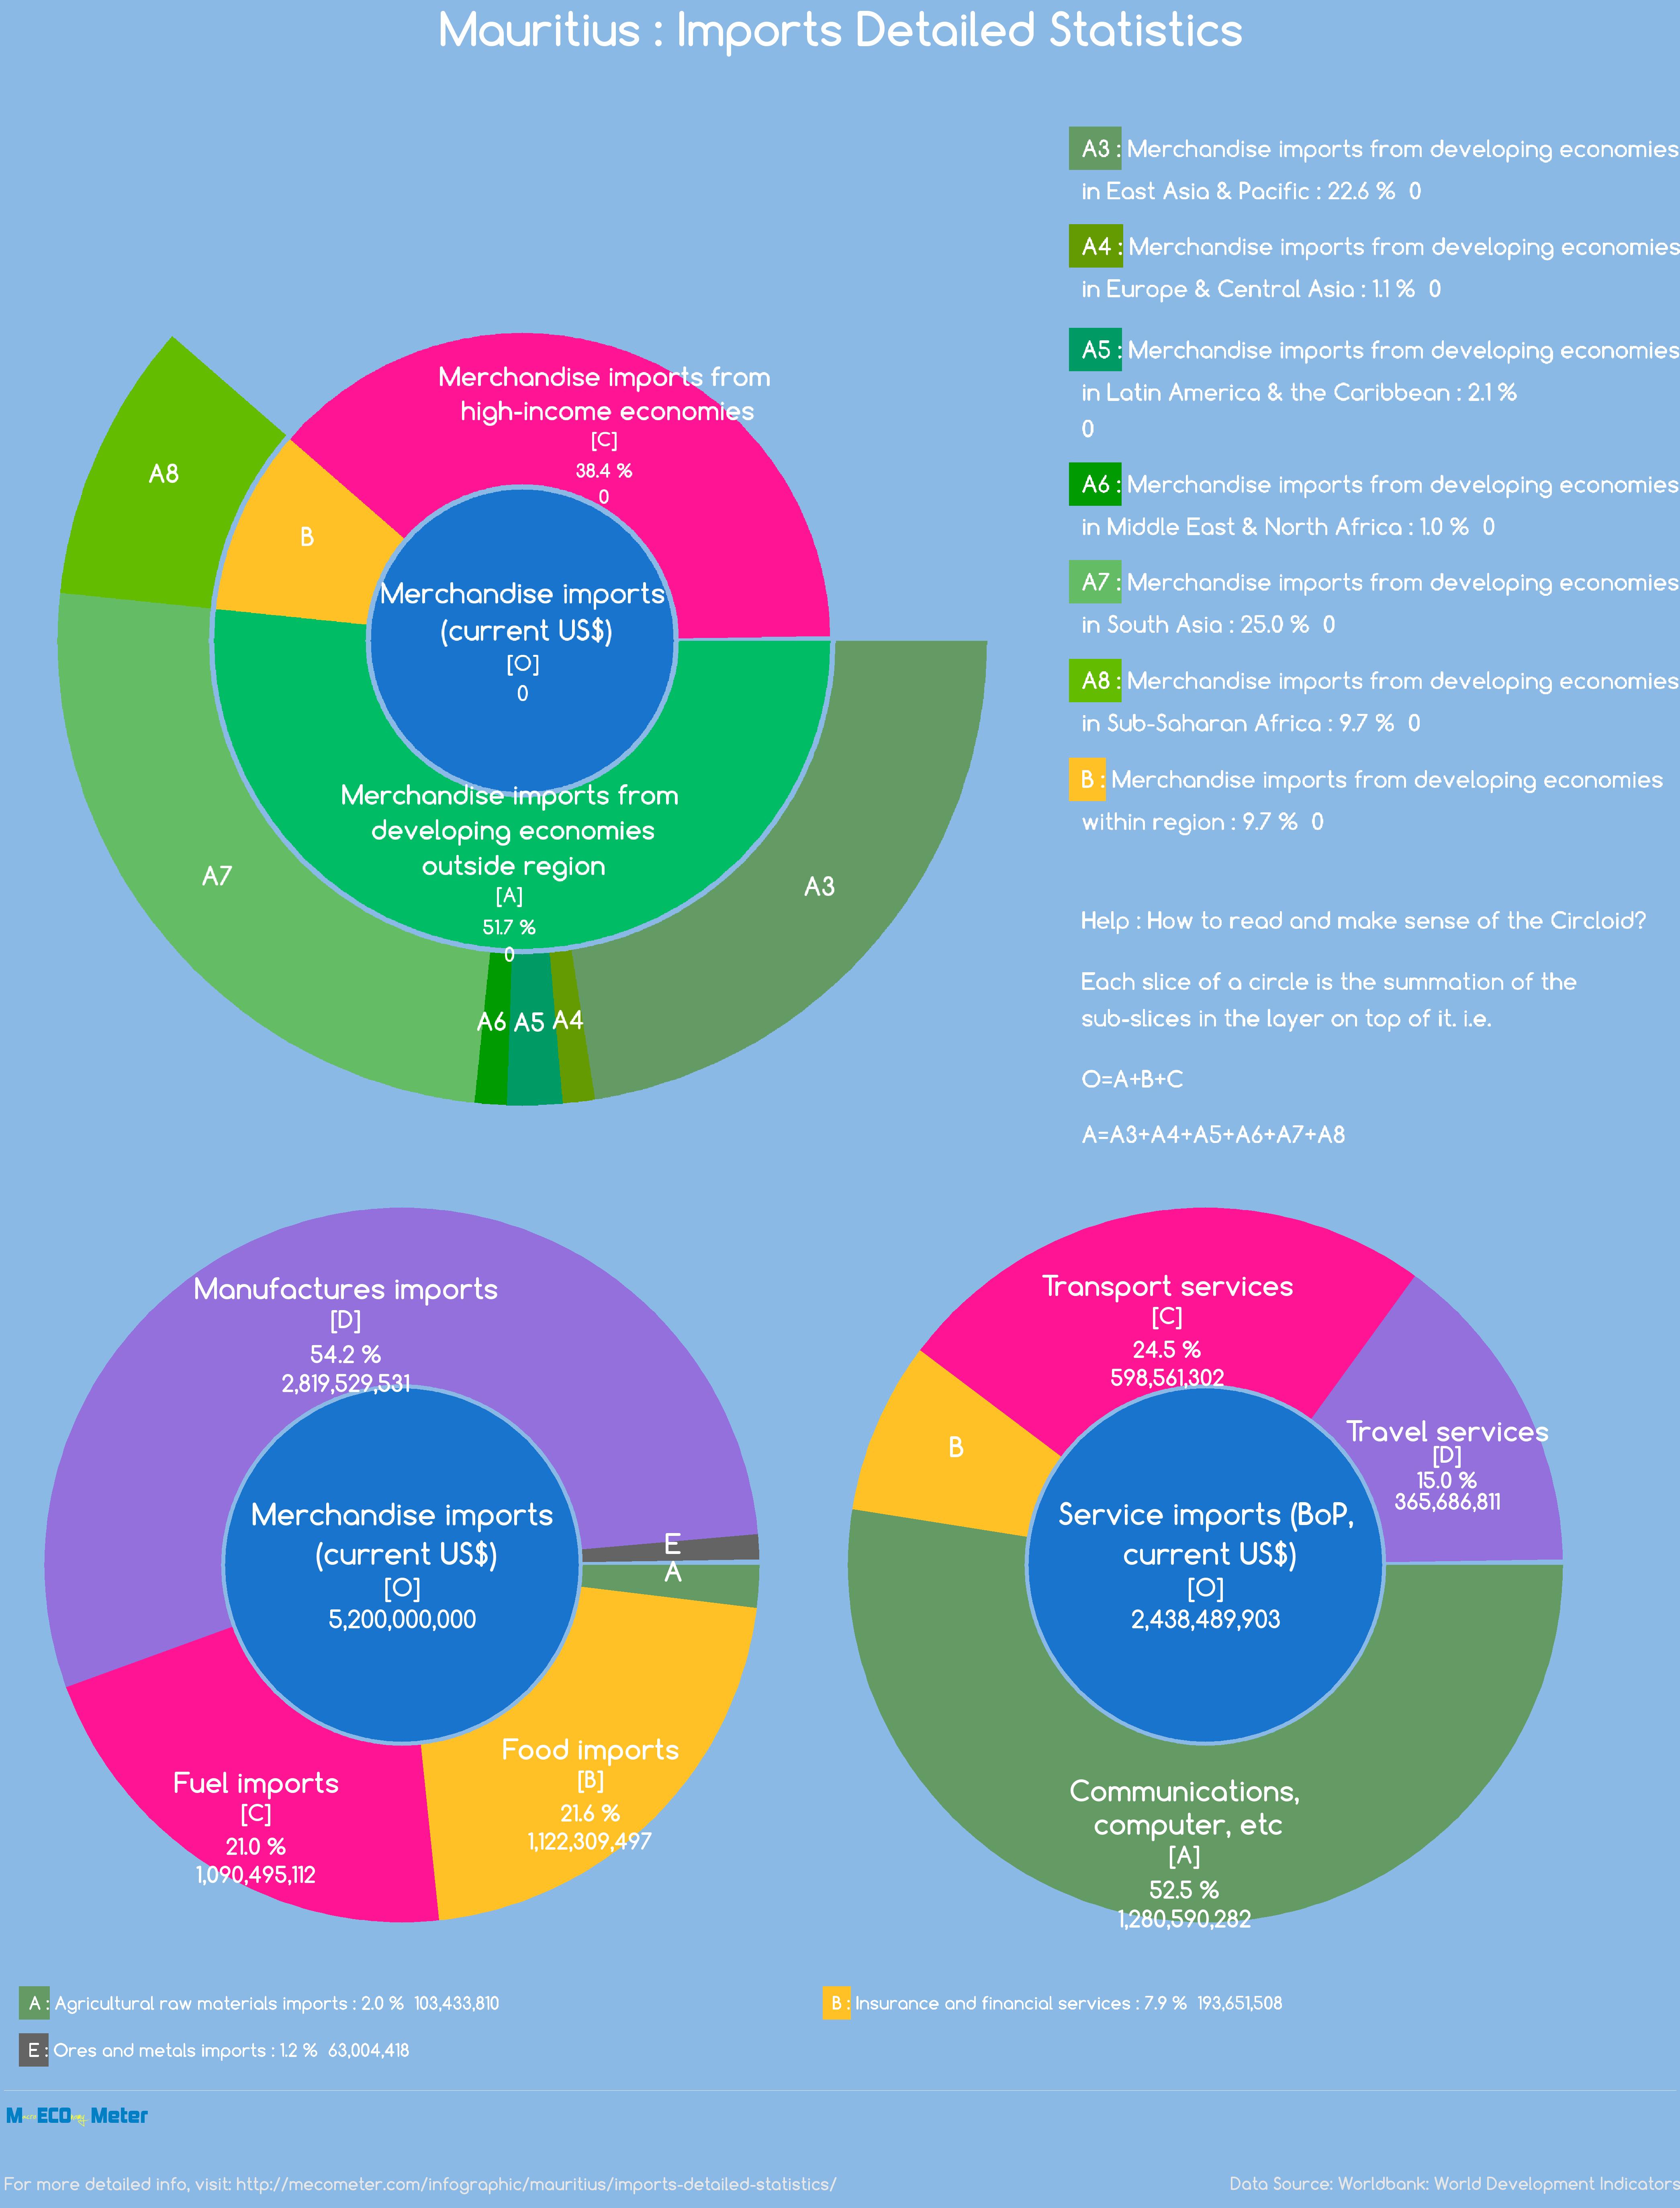 Mauritius : Imports Detailed Statistics